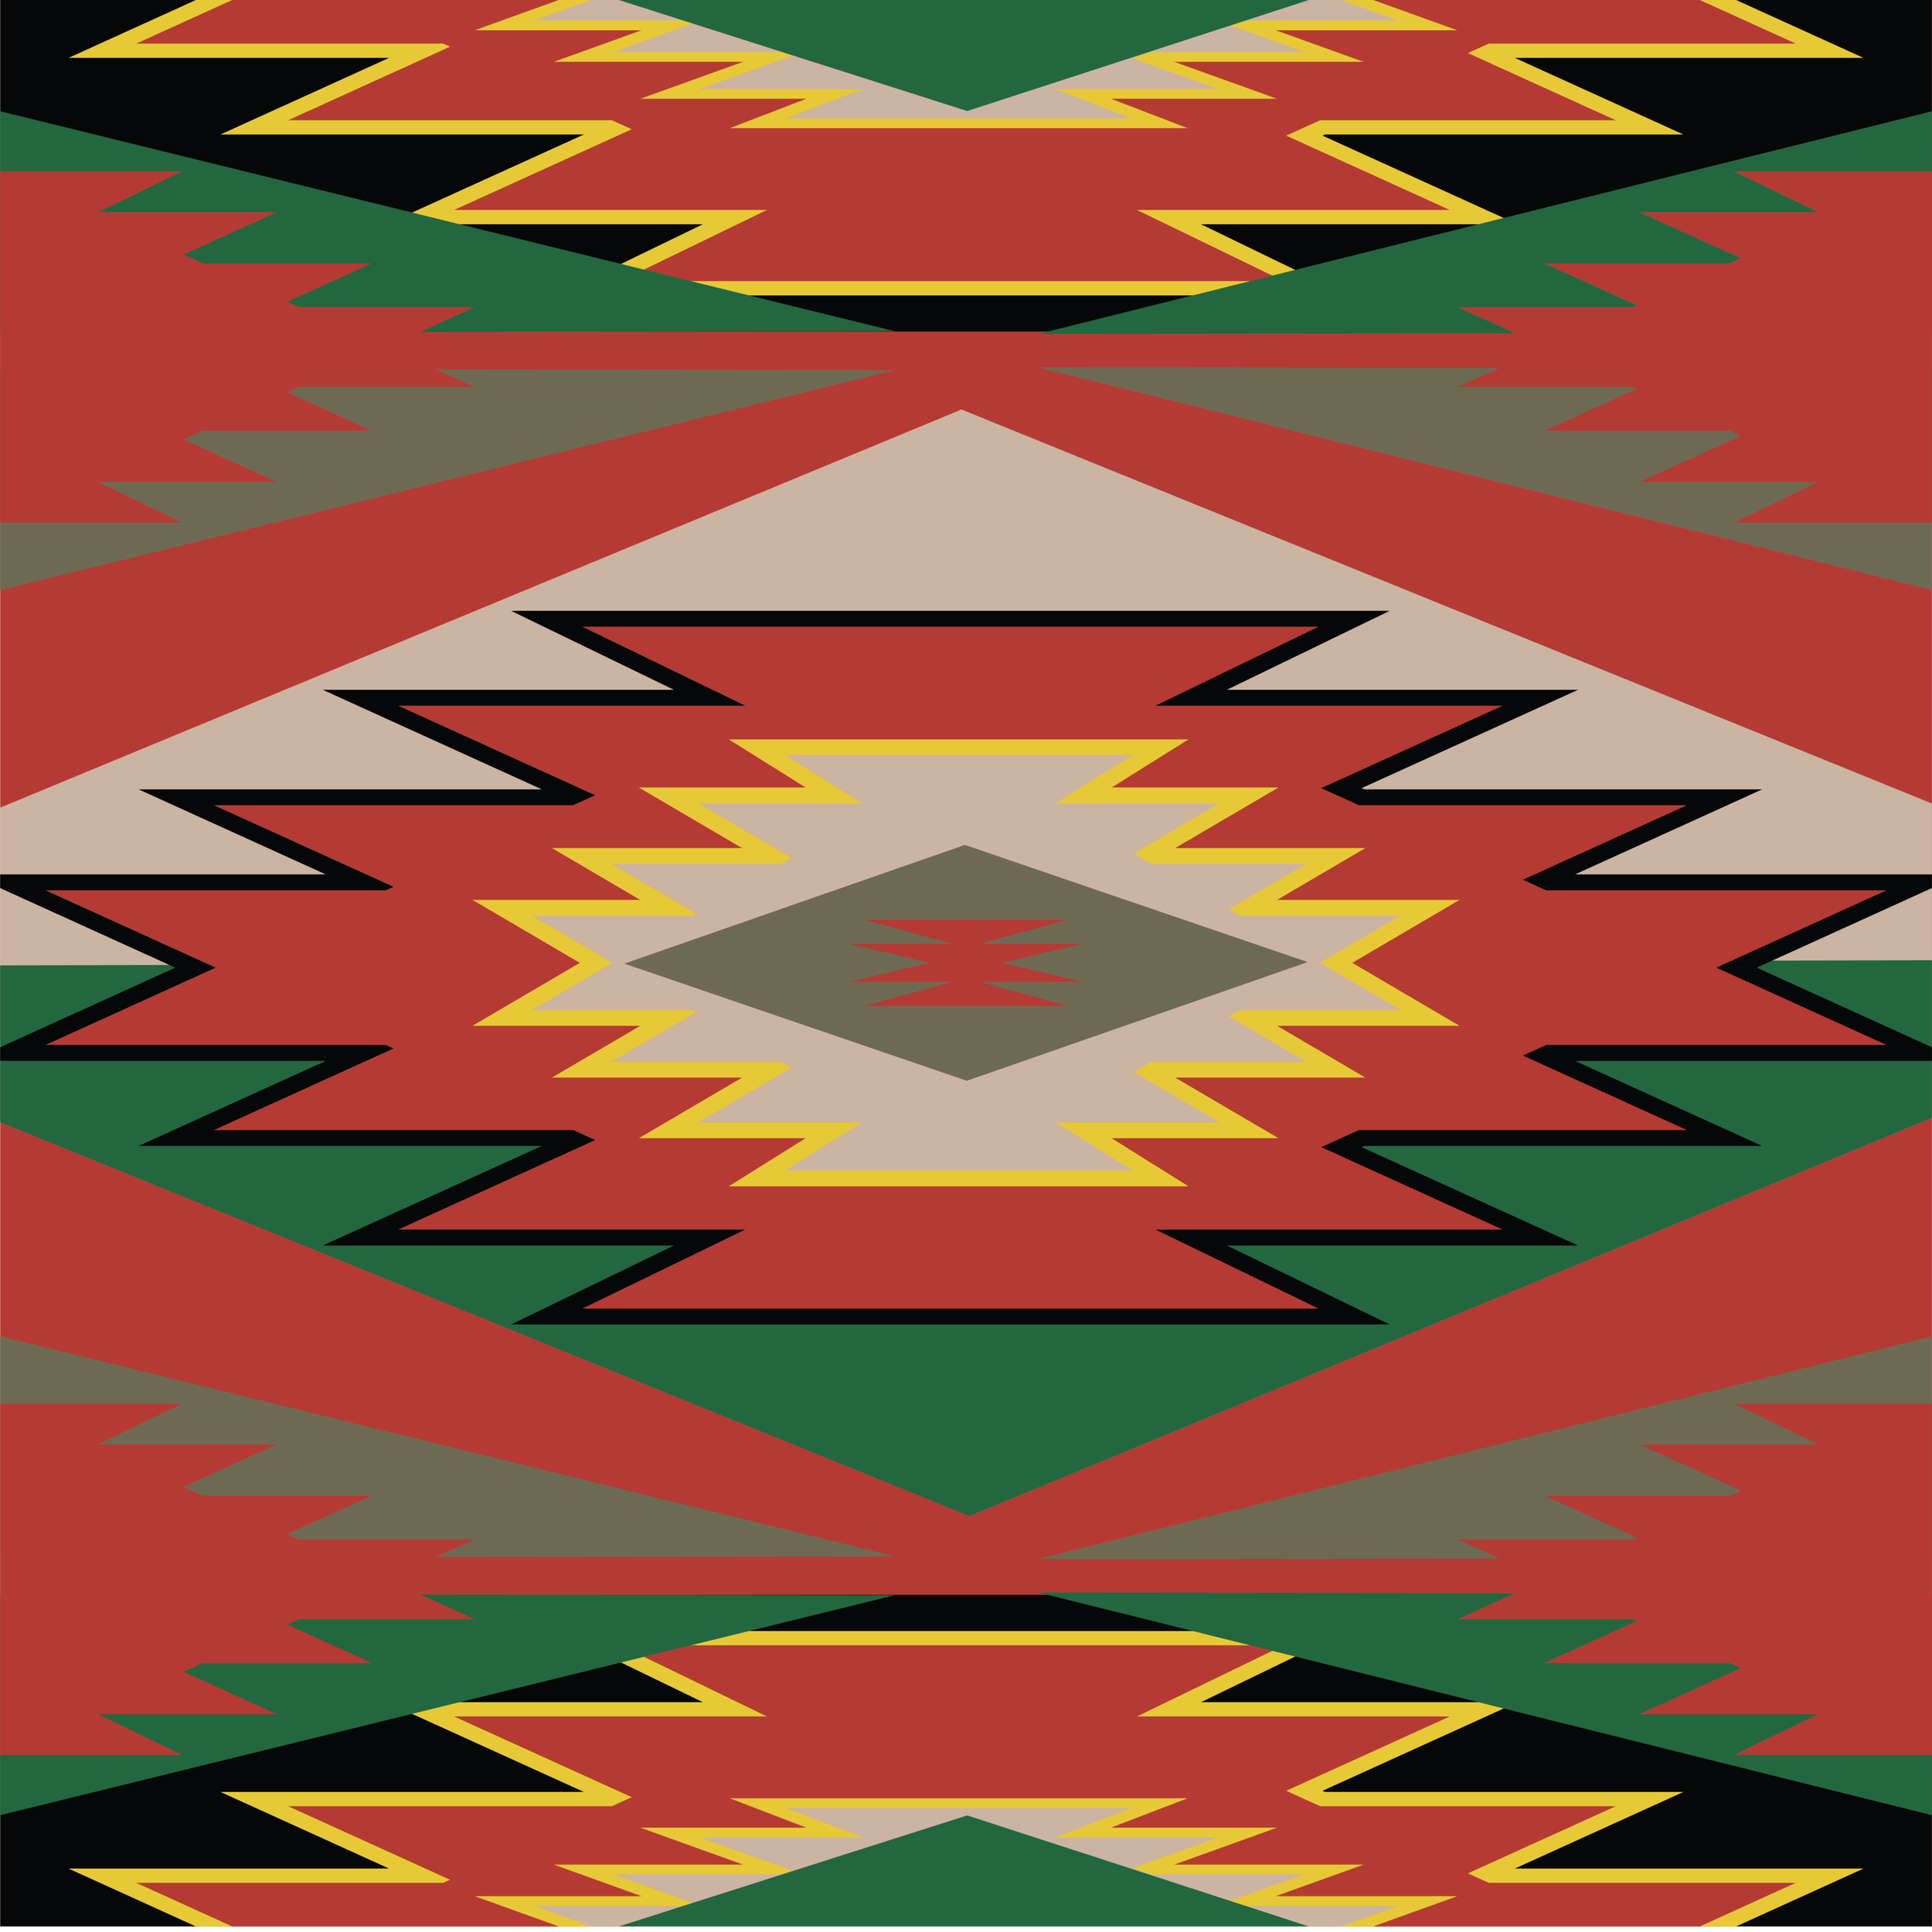 nativePatternOdessa-01.png